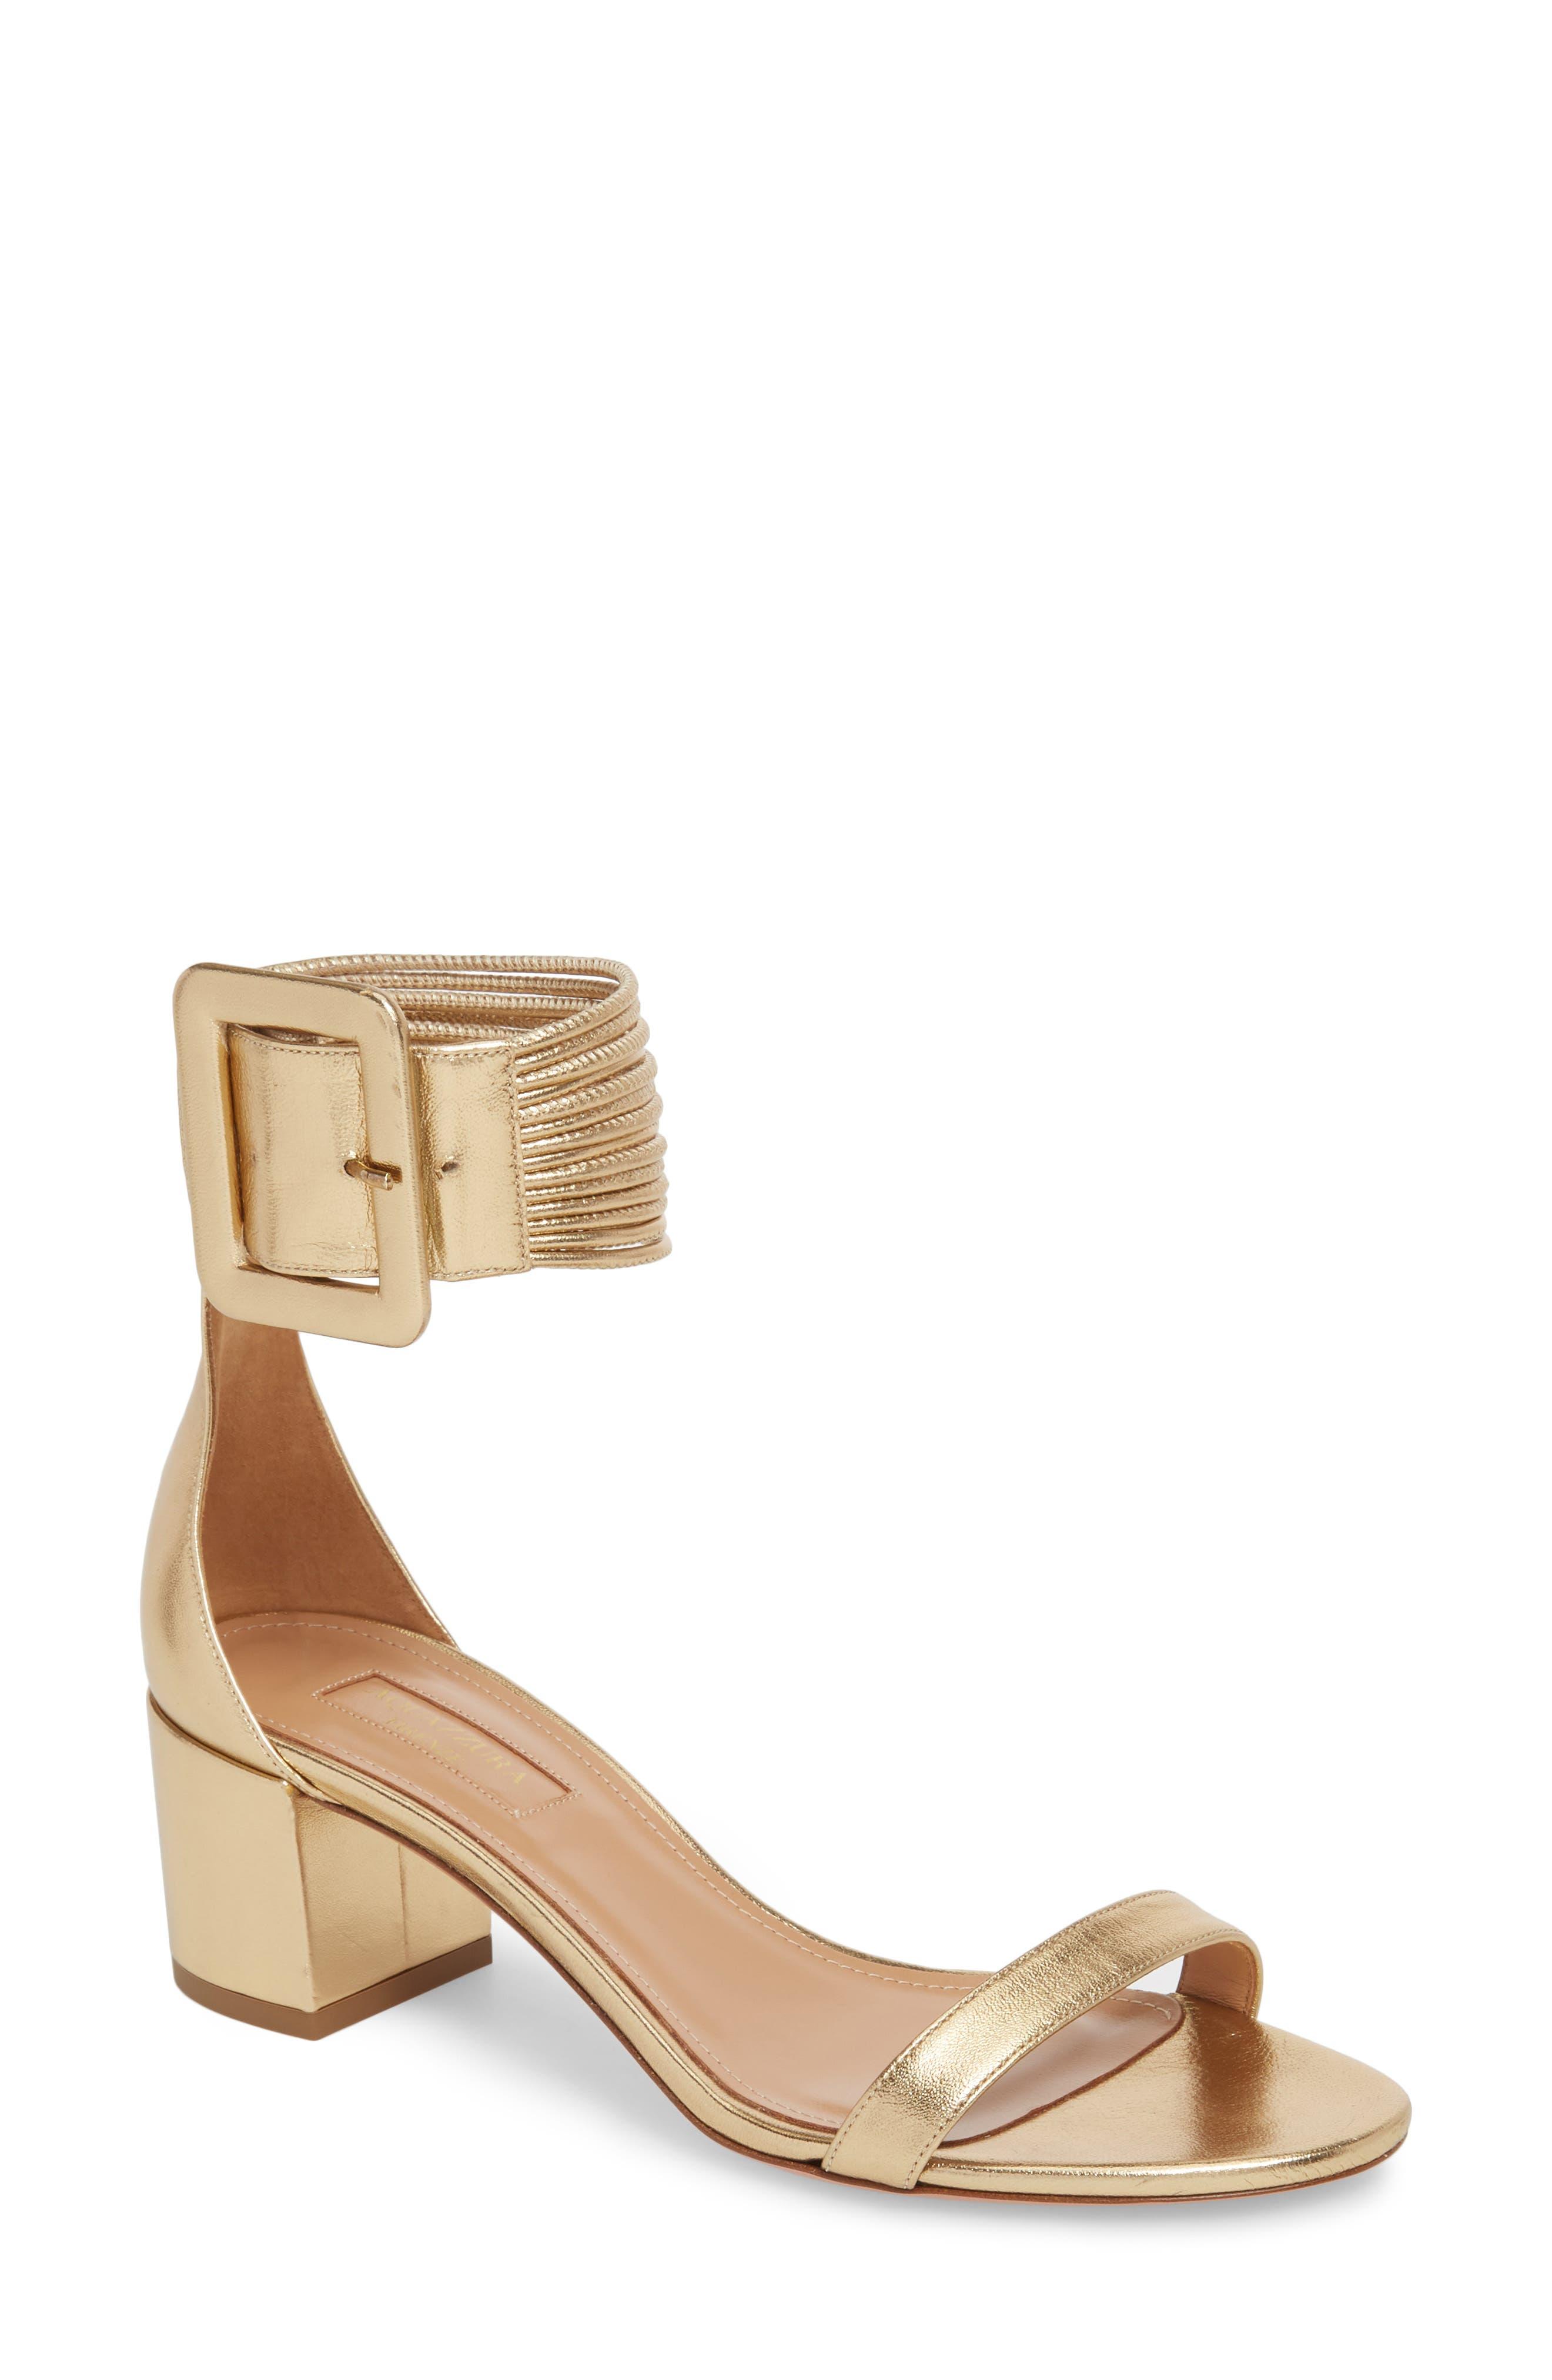 Casablanca Ankle Cuff Sandal,                             Main thumbnail 1, color,                             Soft Gold